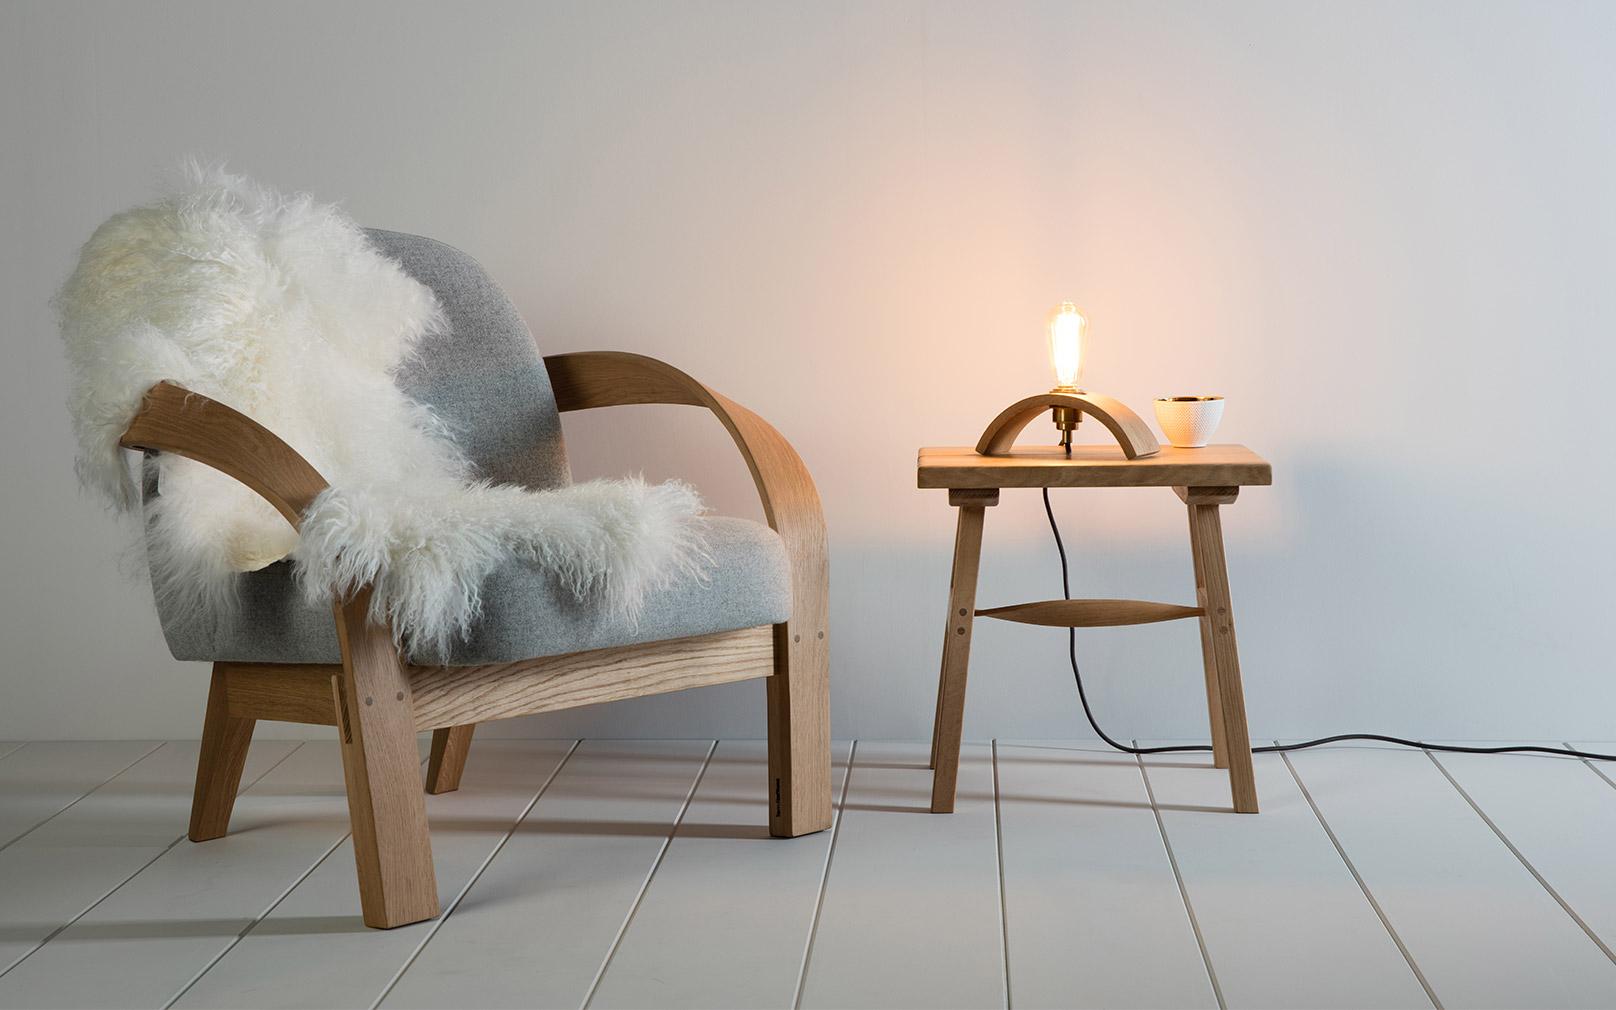 Tom-Raffield_furniture-l-Arbor-Armchair-3.jpg